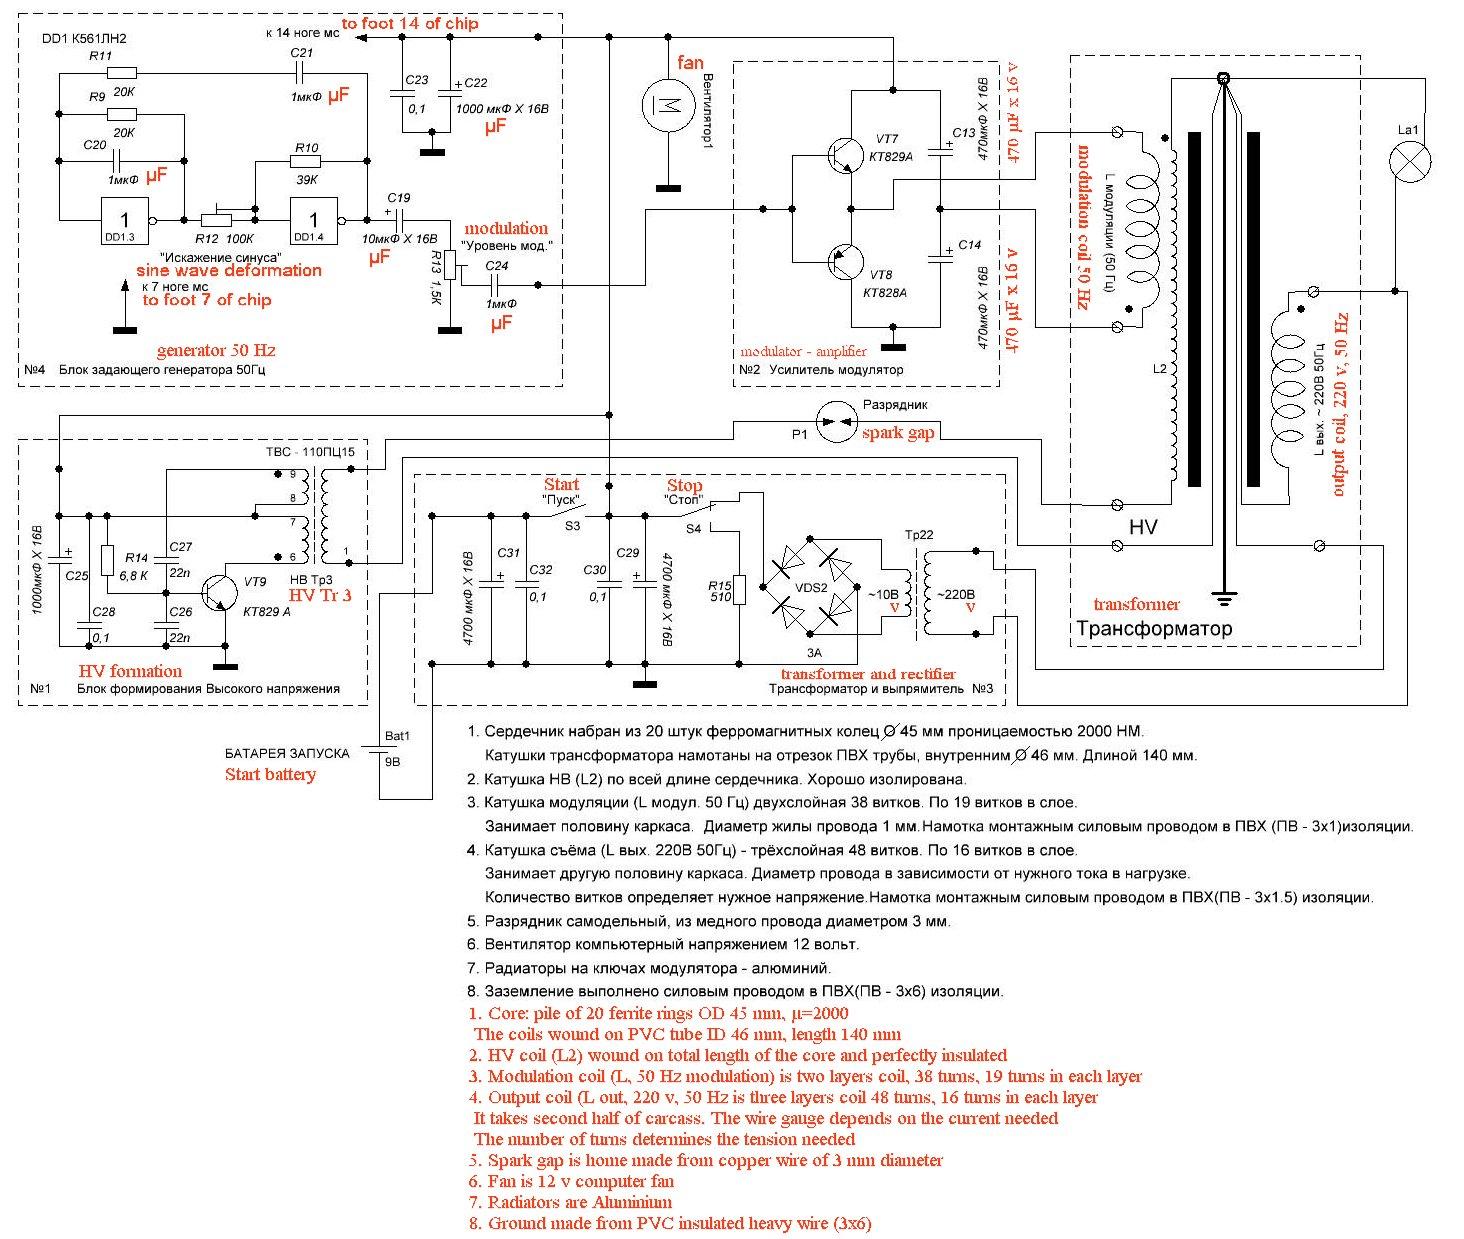 Kapanadze Schaltung Mikrocontroller Net